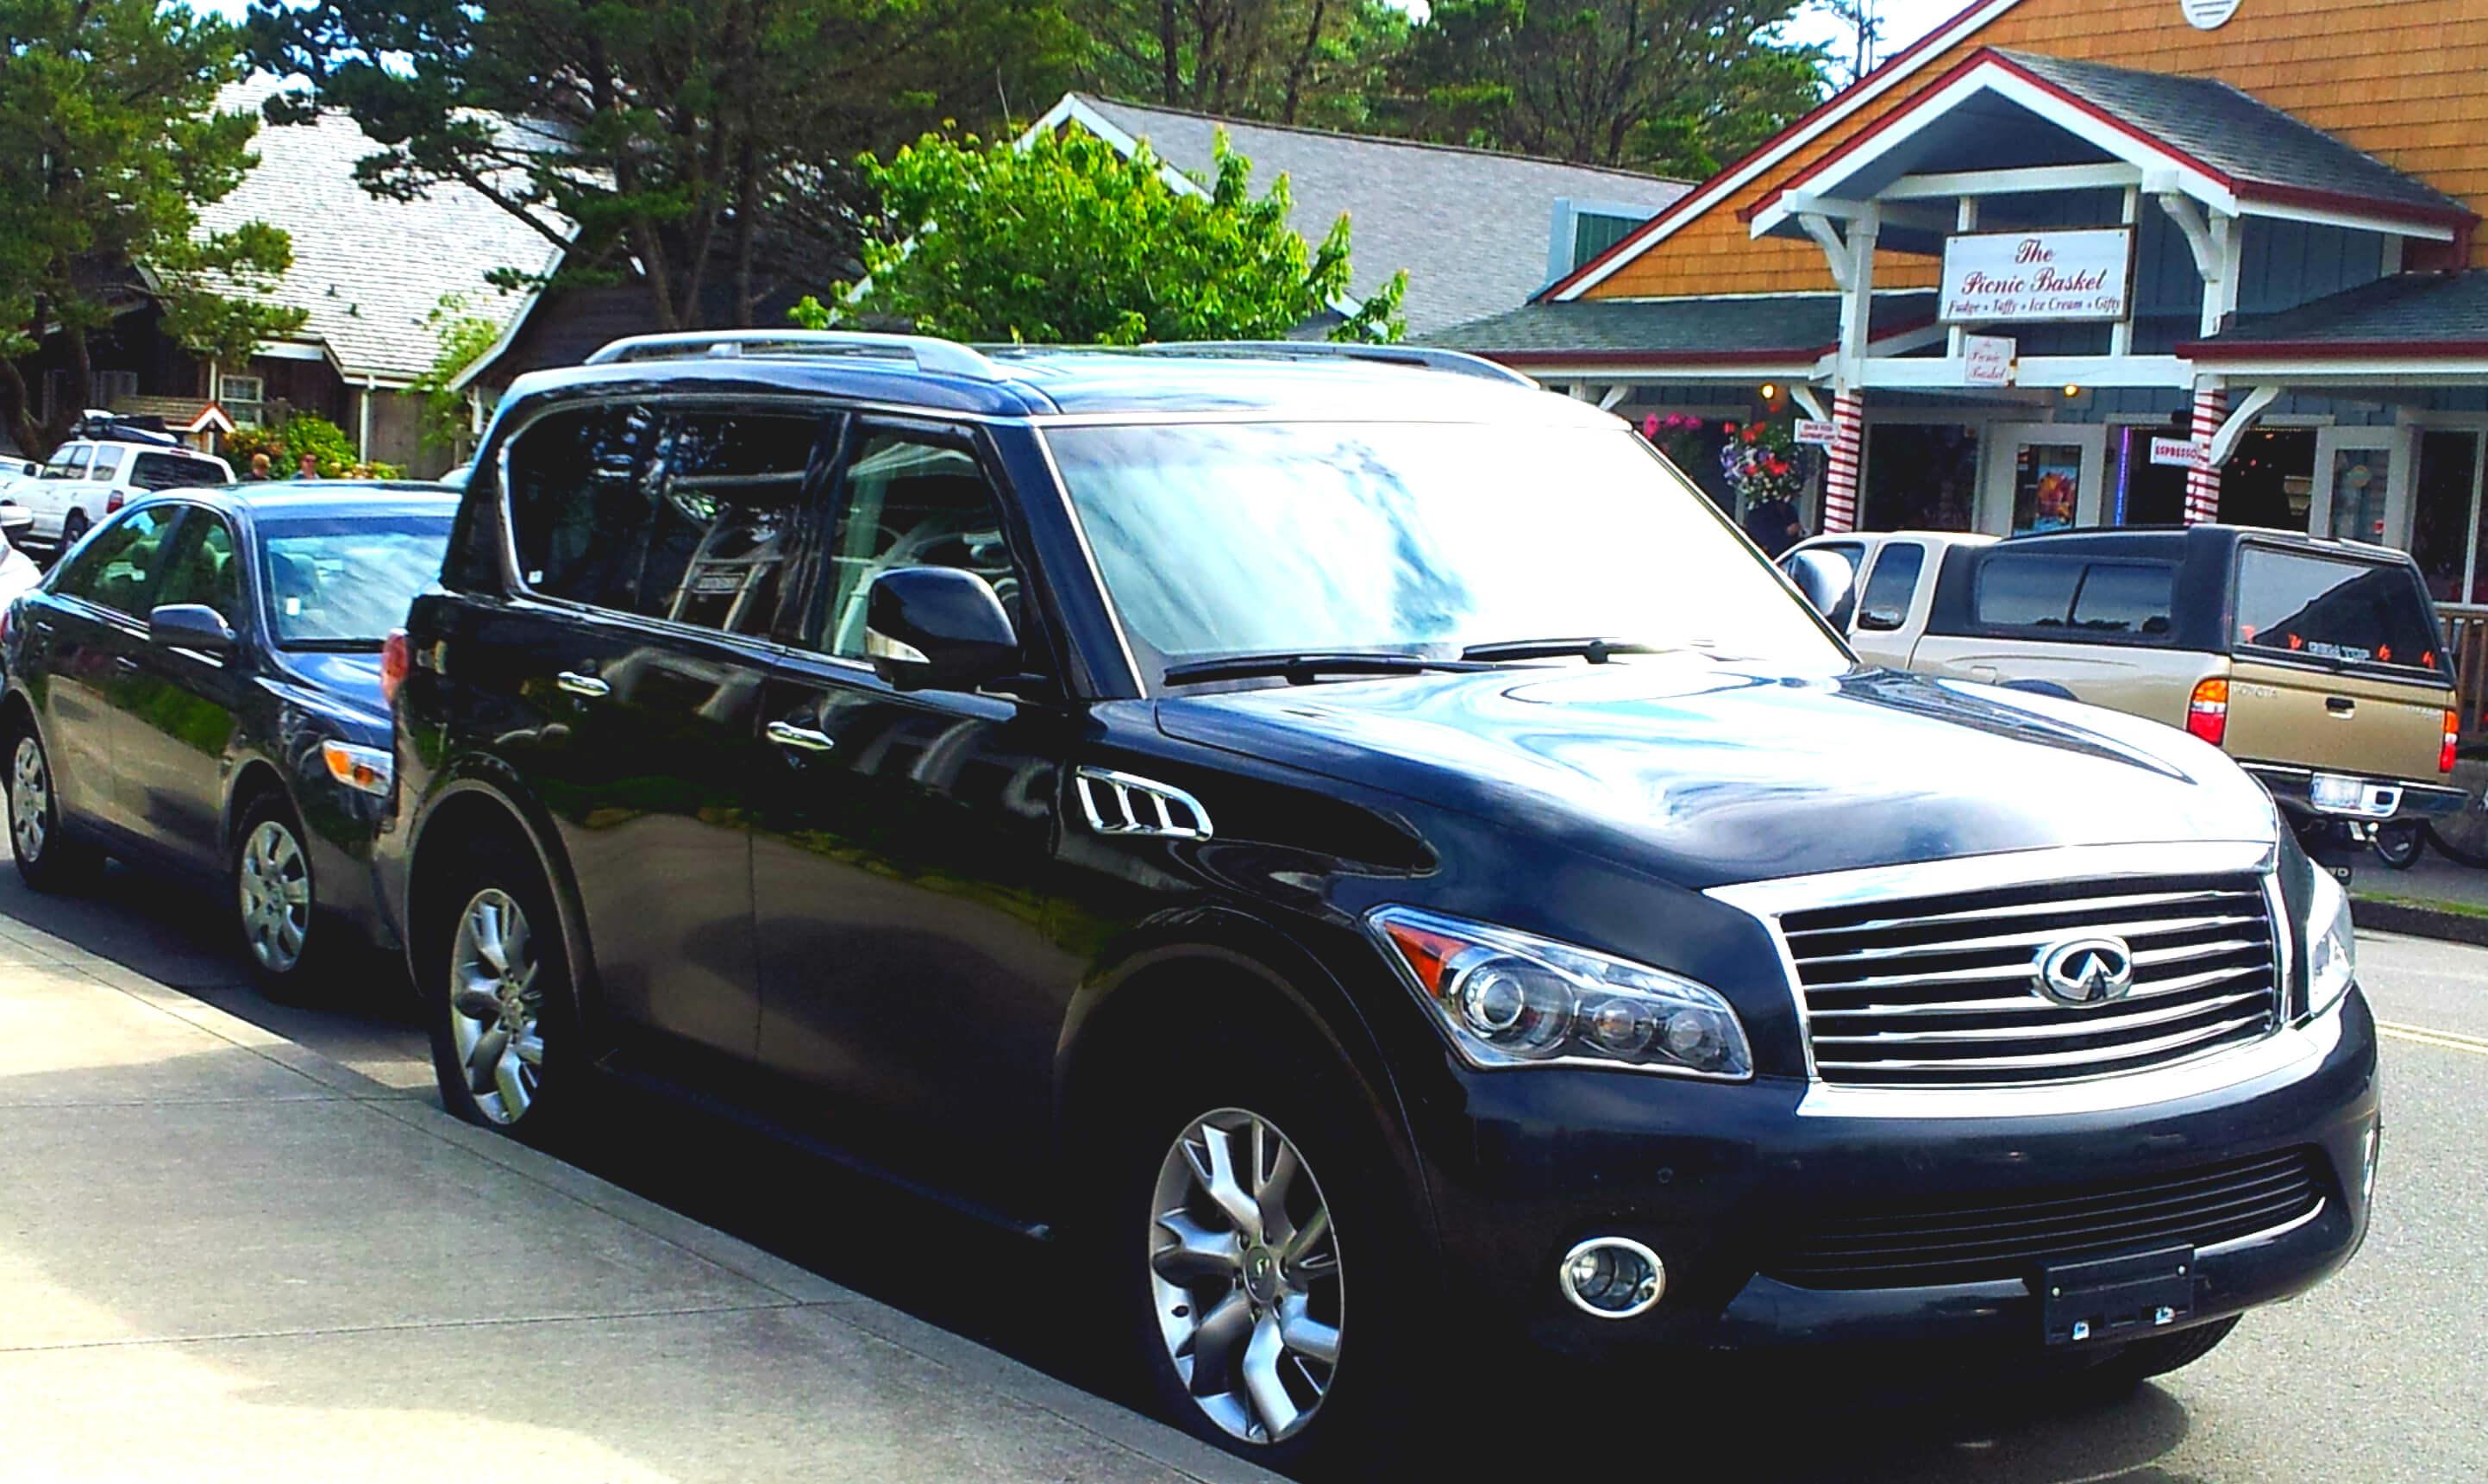 Invest America Insurance - Las Vegas Auto Insurance Agent